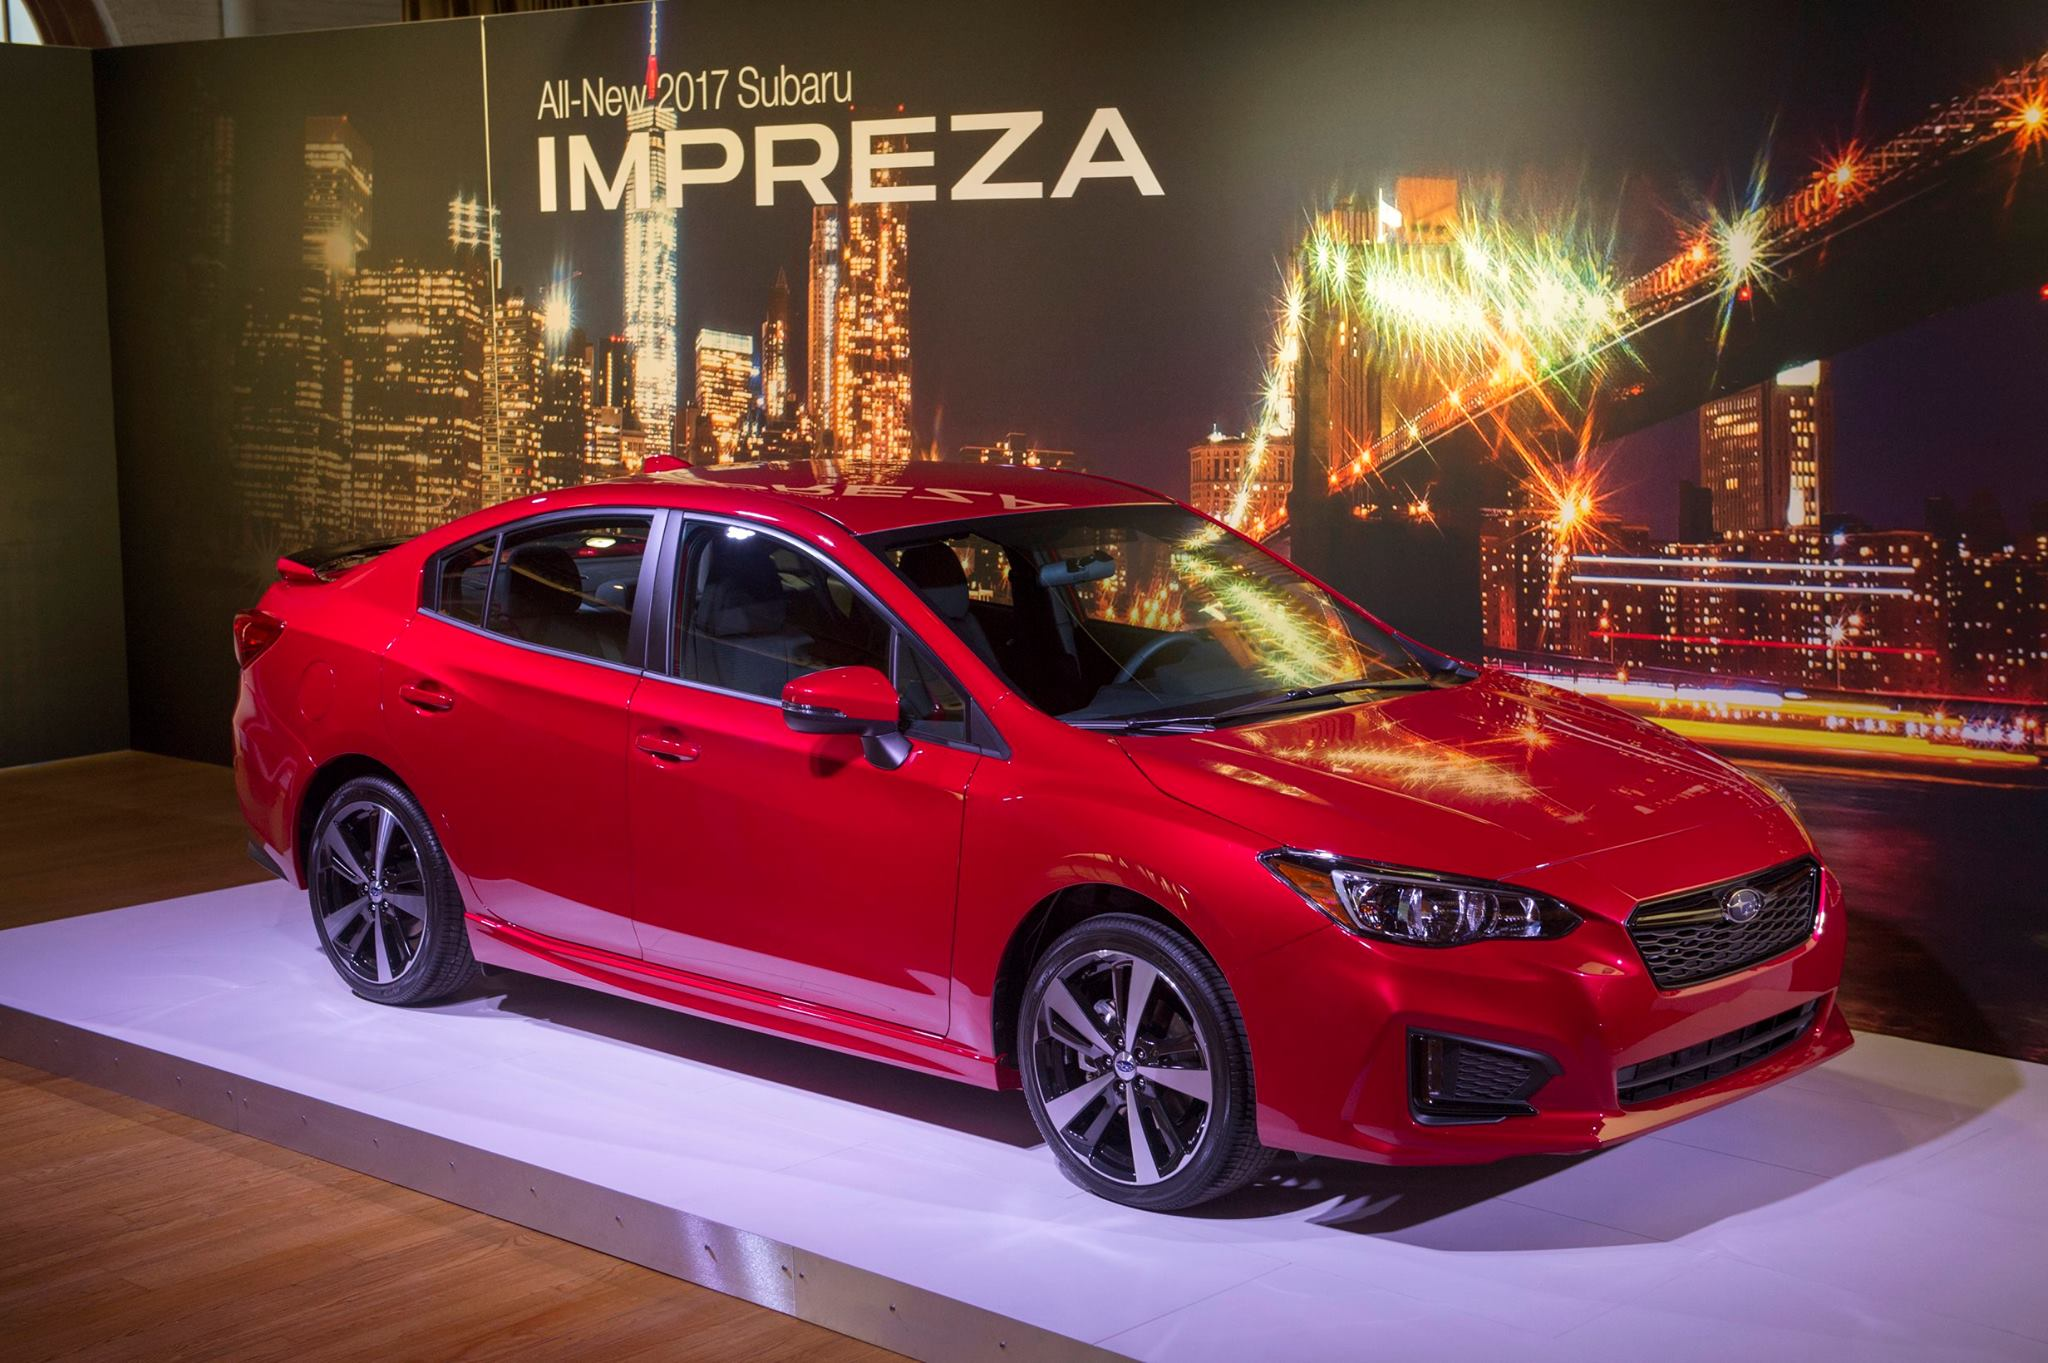 2017 Subaru Impreza hatch and sedan gallery - photos ...